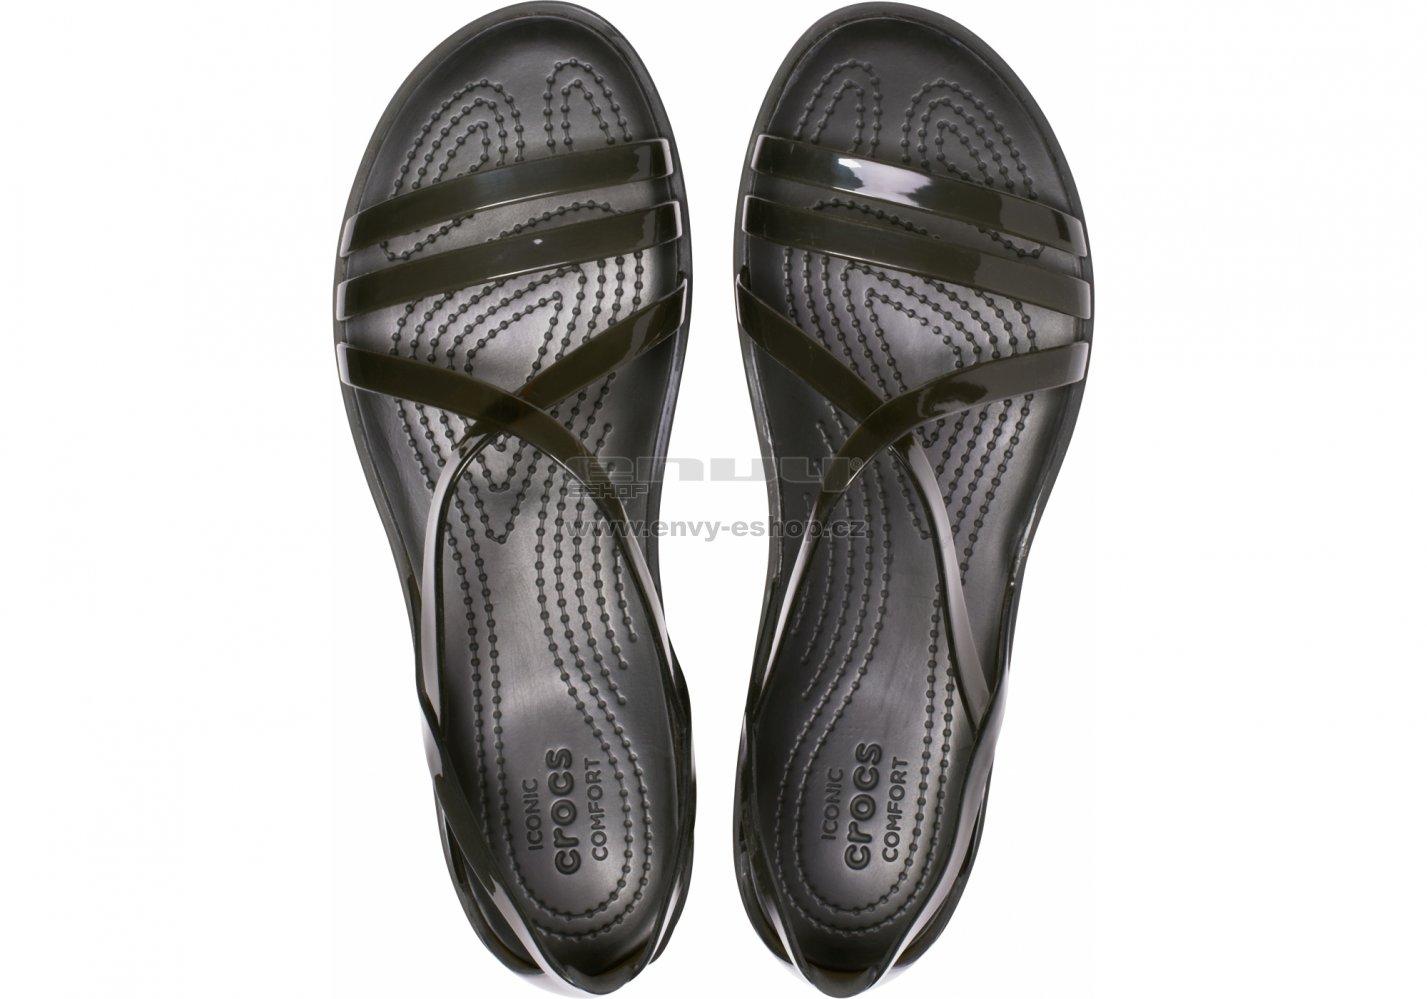 dd7add891378 Dámské sandále CROCS ISABELLA STRAPPY SANDAL 204915-001 BLACK ...